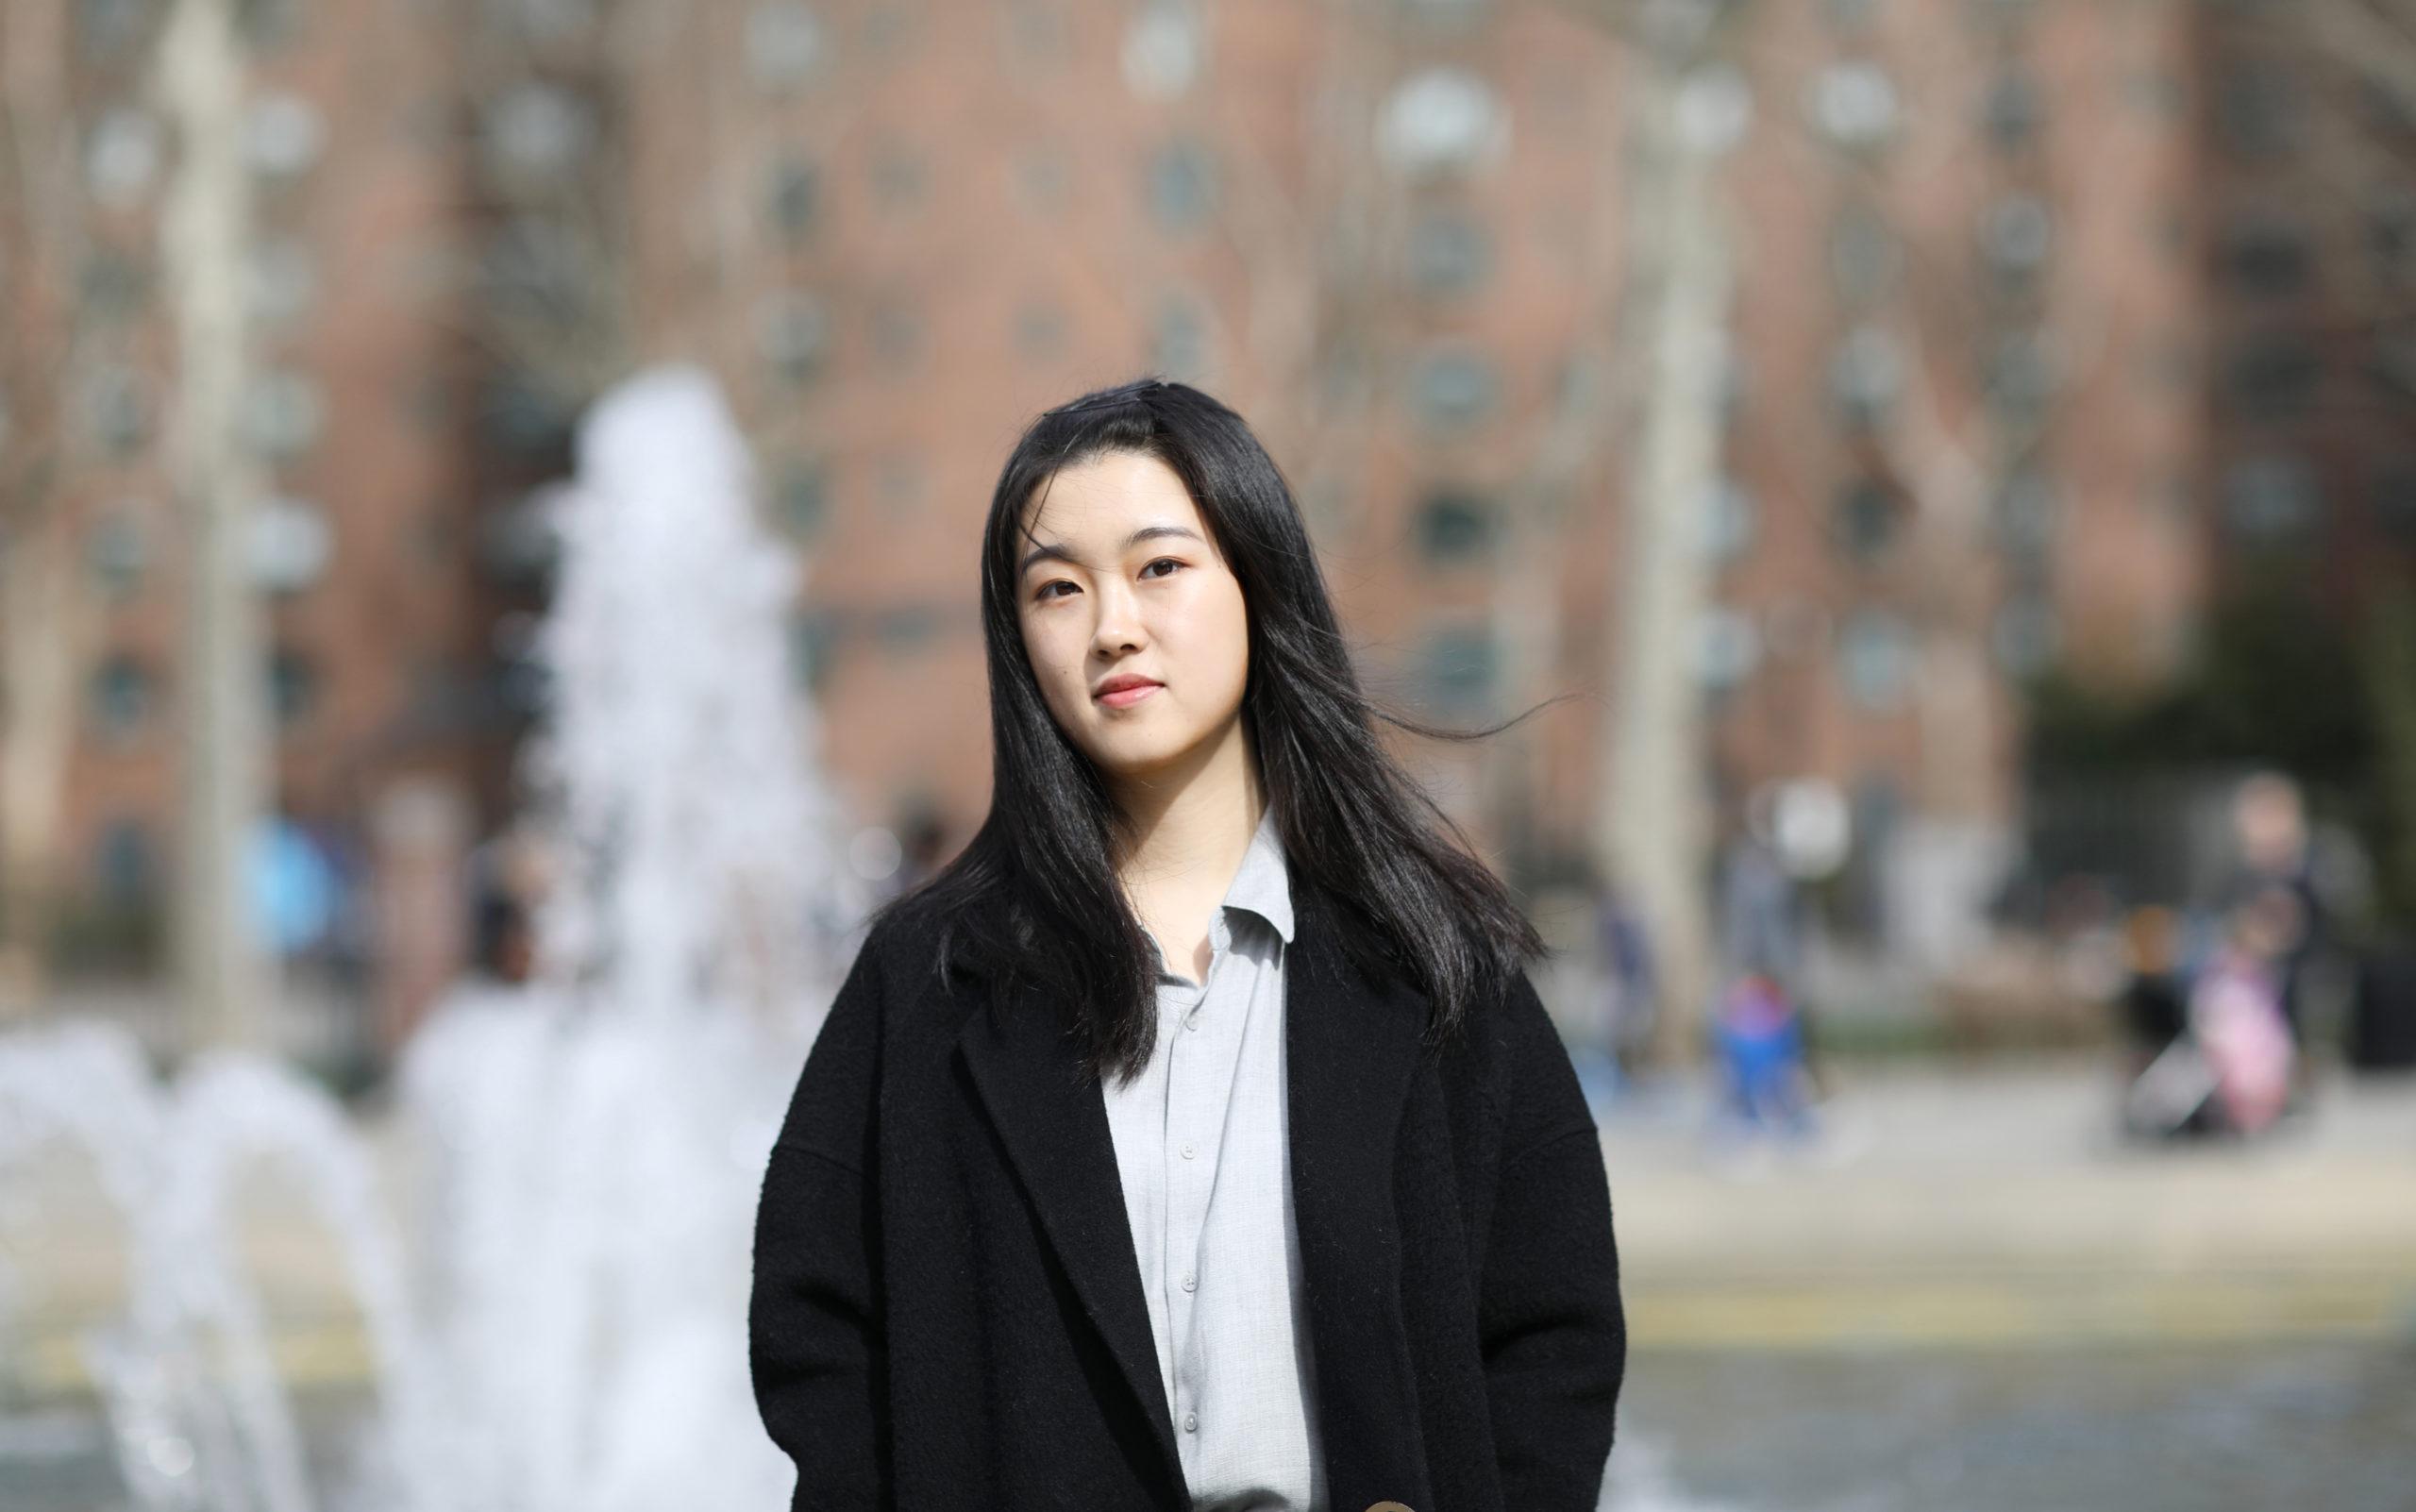 Yiwen Chen portrait